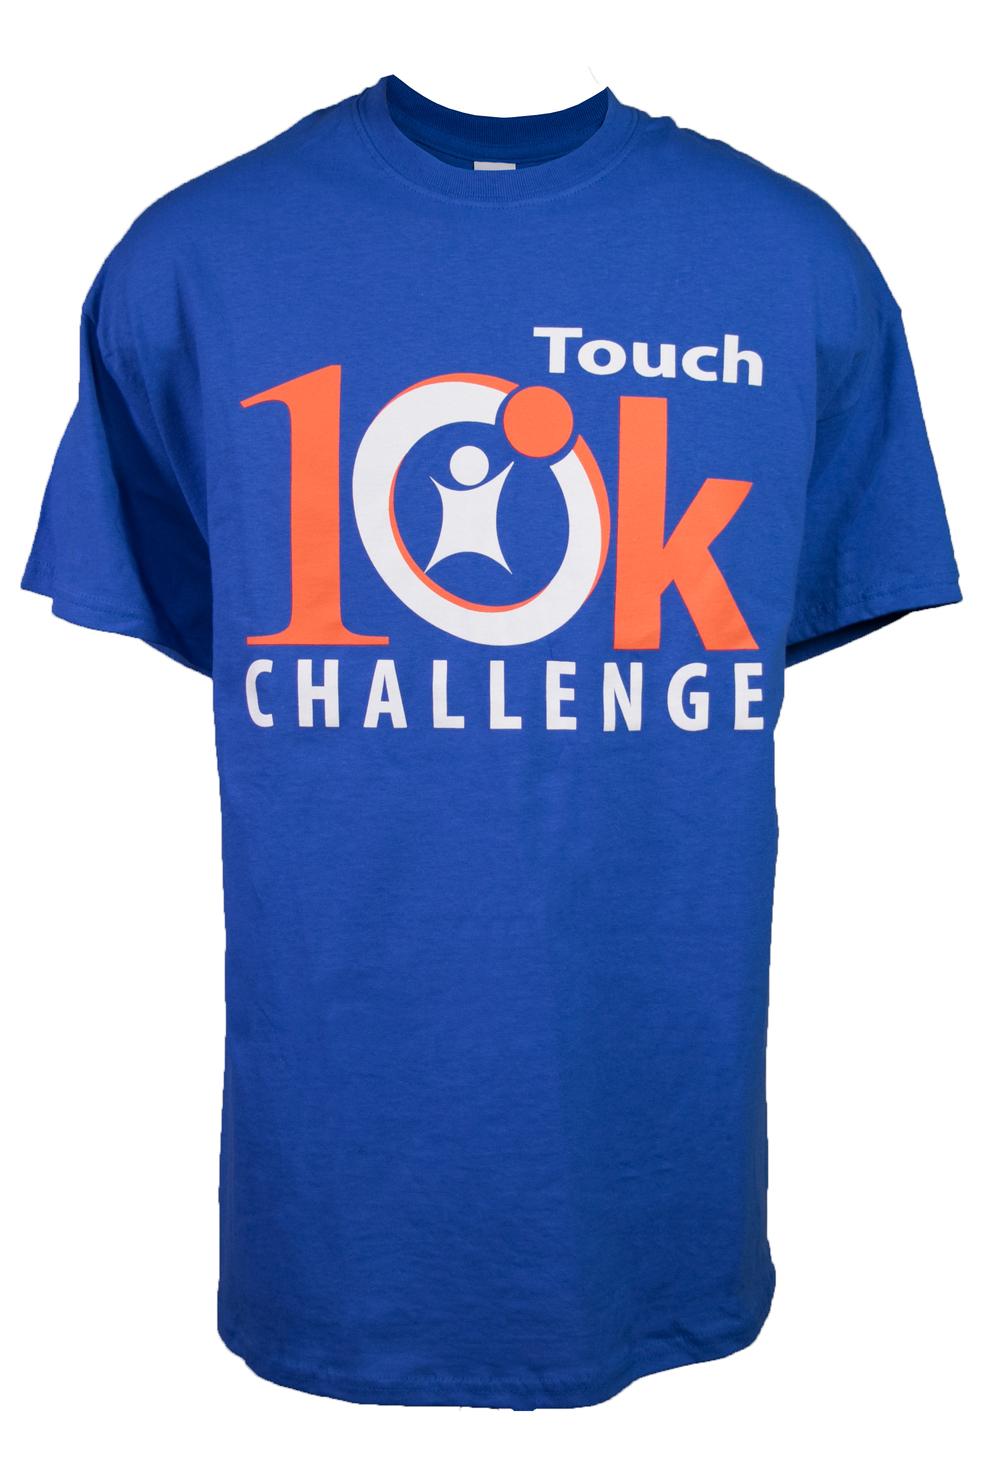 Camiseta Touch 10K Challenge